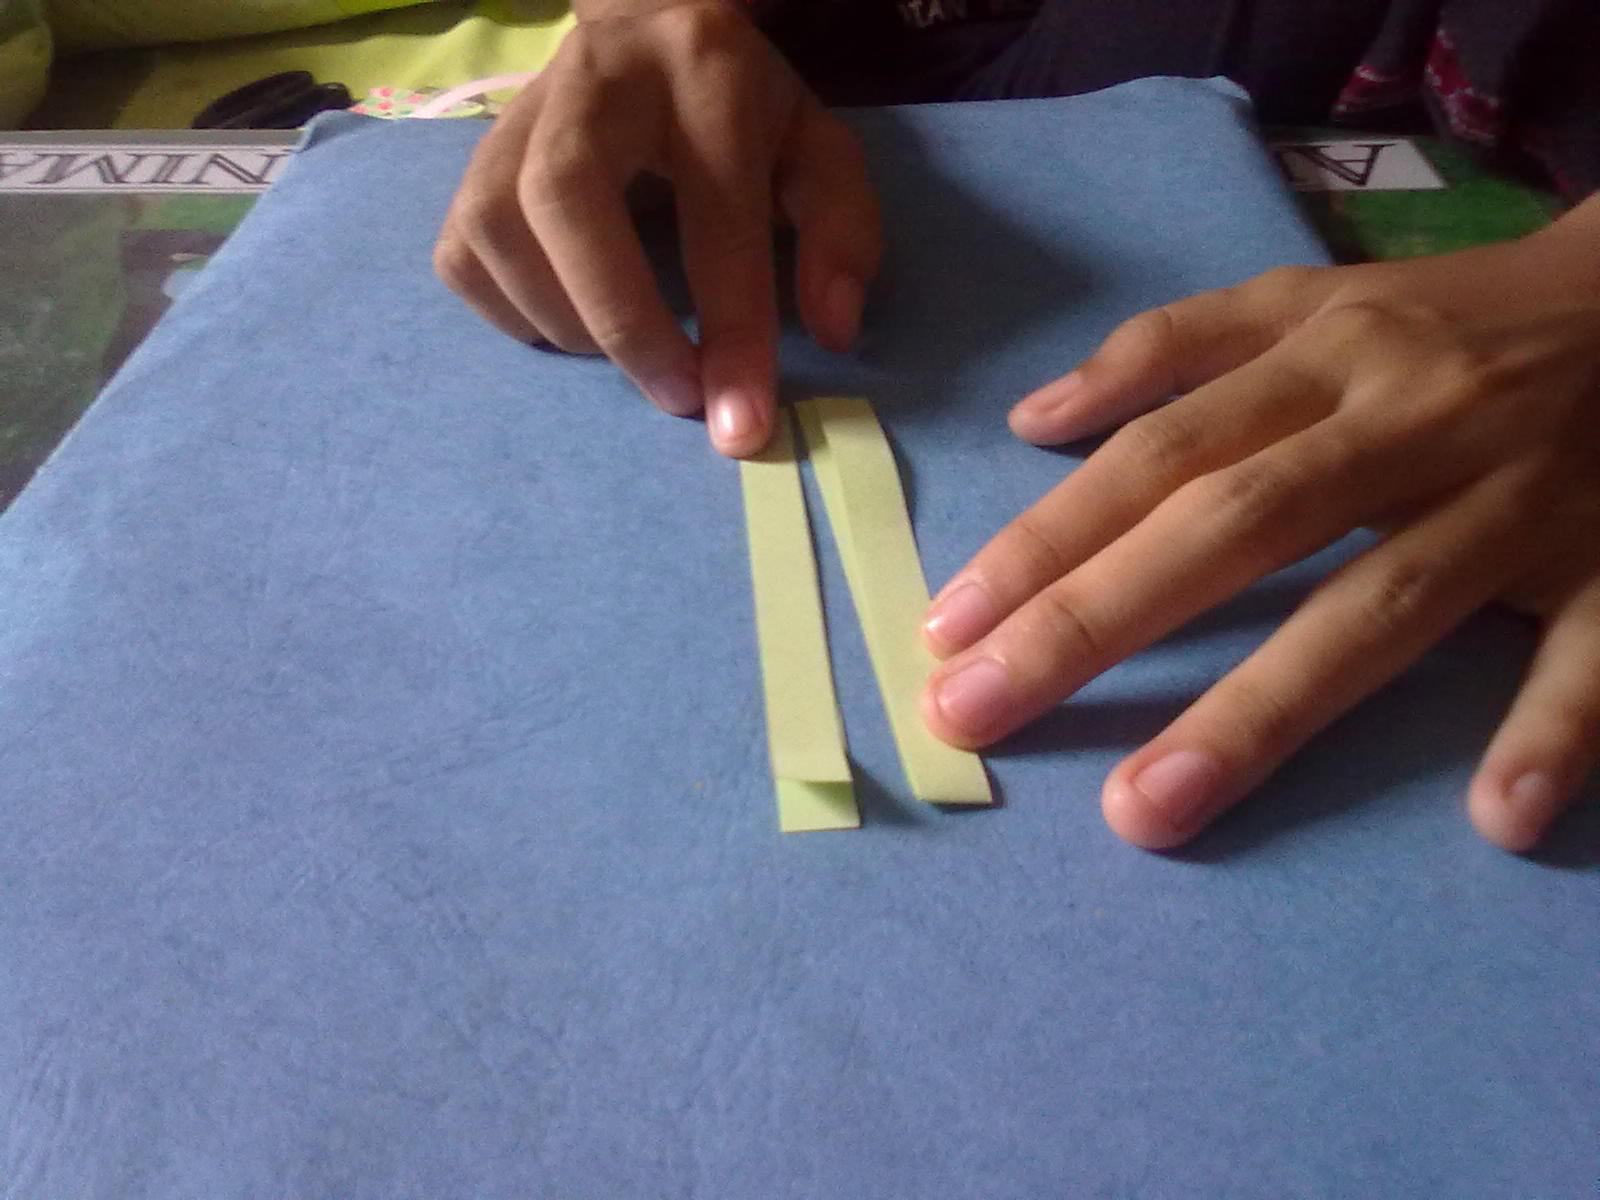 Lalu.. Sejajarkan 2 kertas hijau dan harus berlawanan arah..